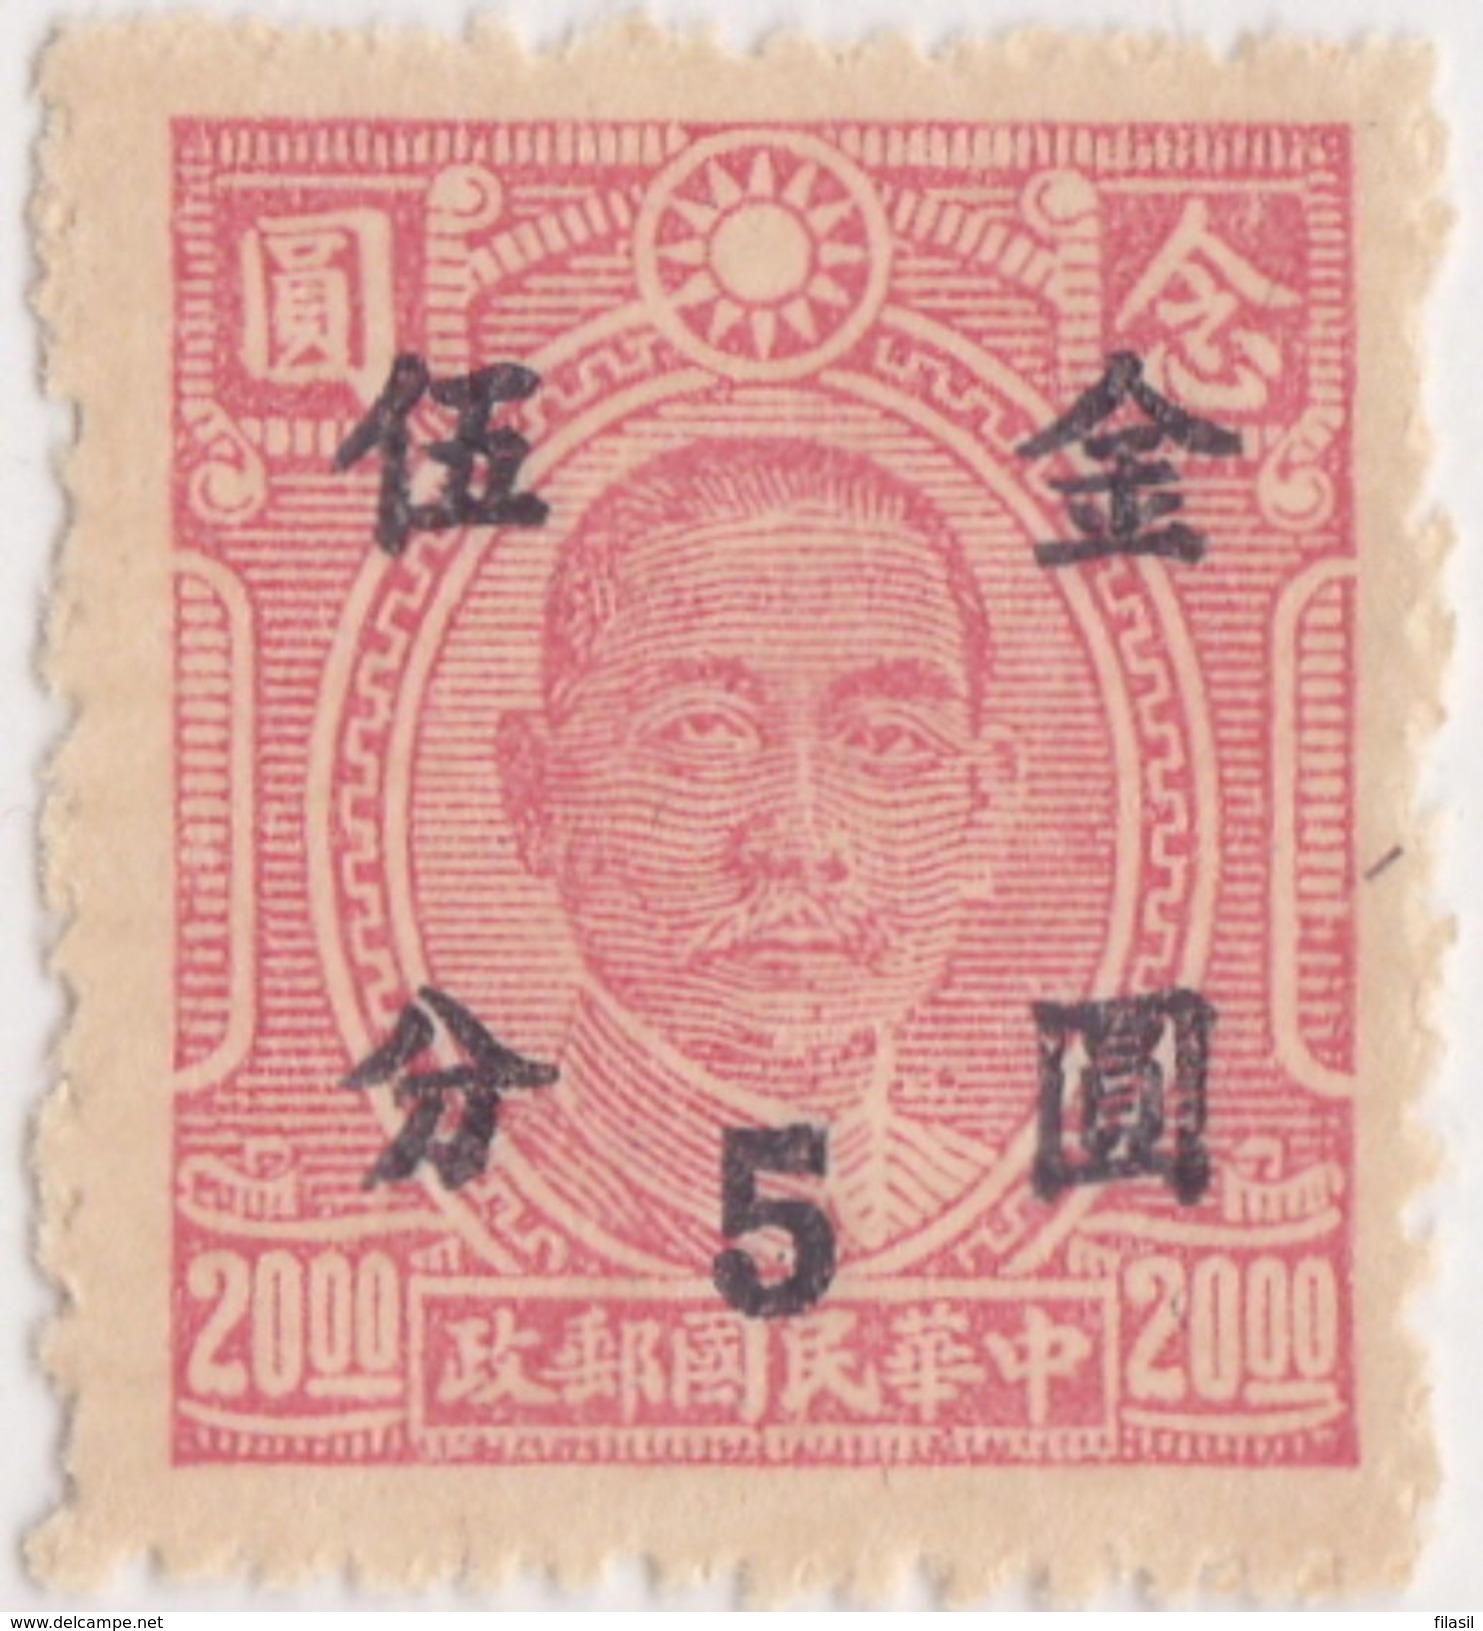 SI53D Cina China Chine 5/20 Rare Fine  Yuan China Stamp  Surcharge NO Gum - 1941-45 Cina Del Nord